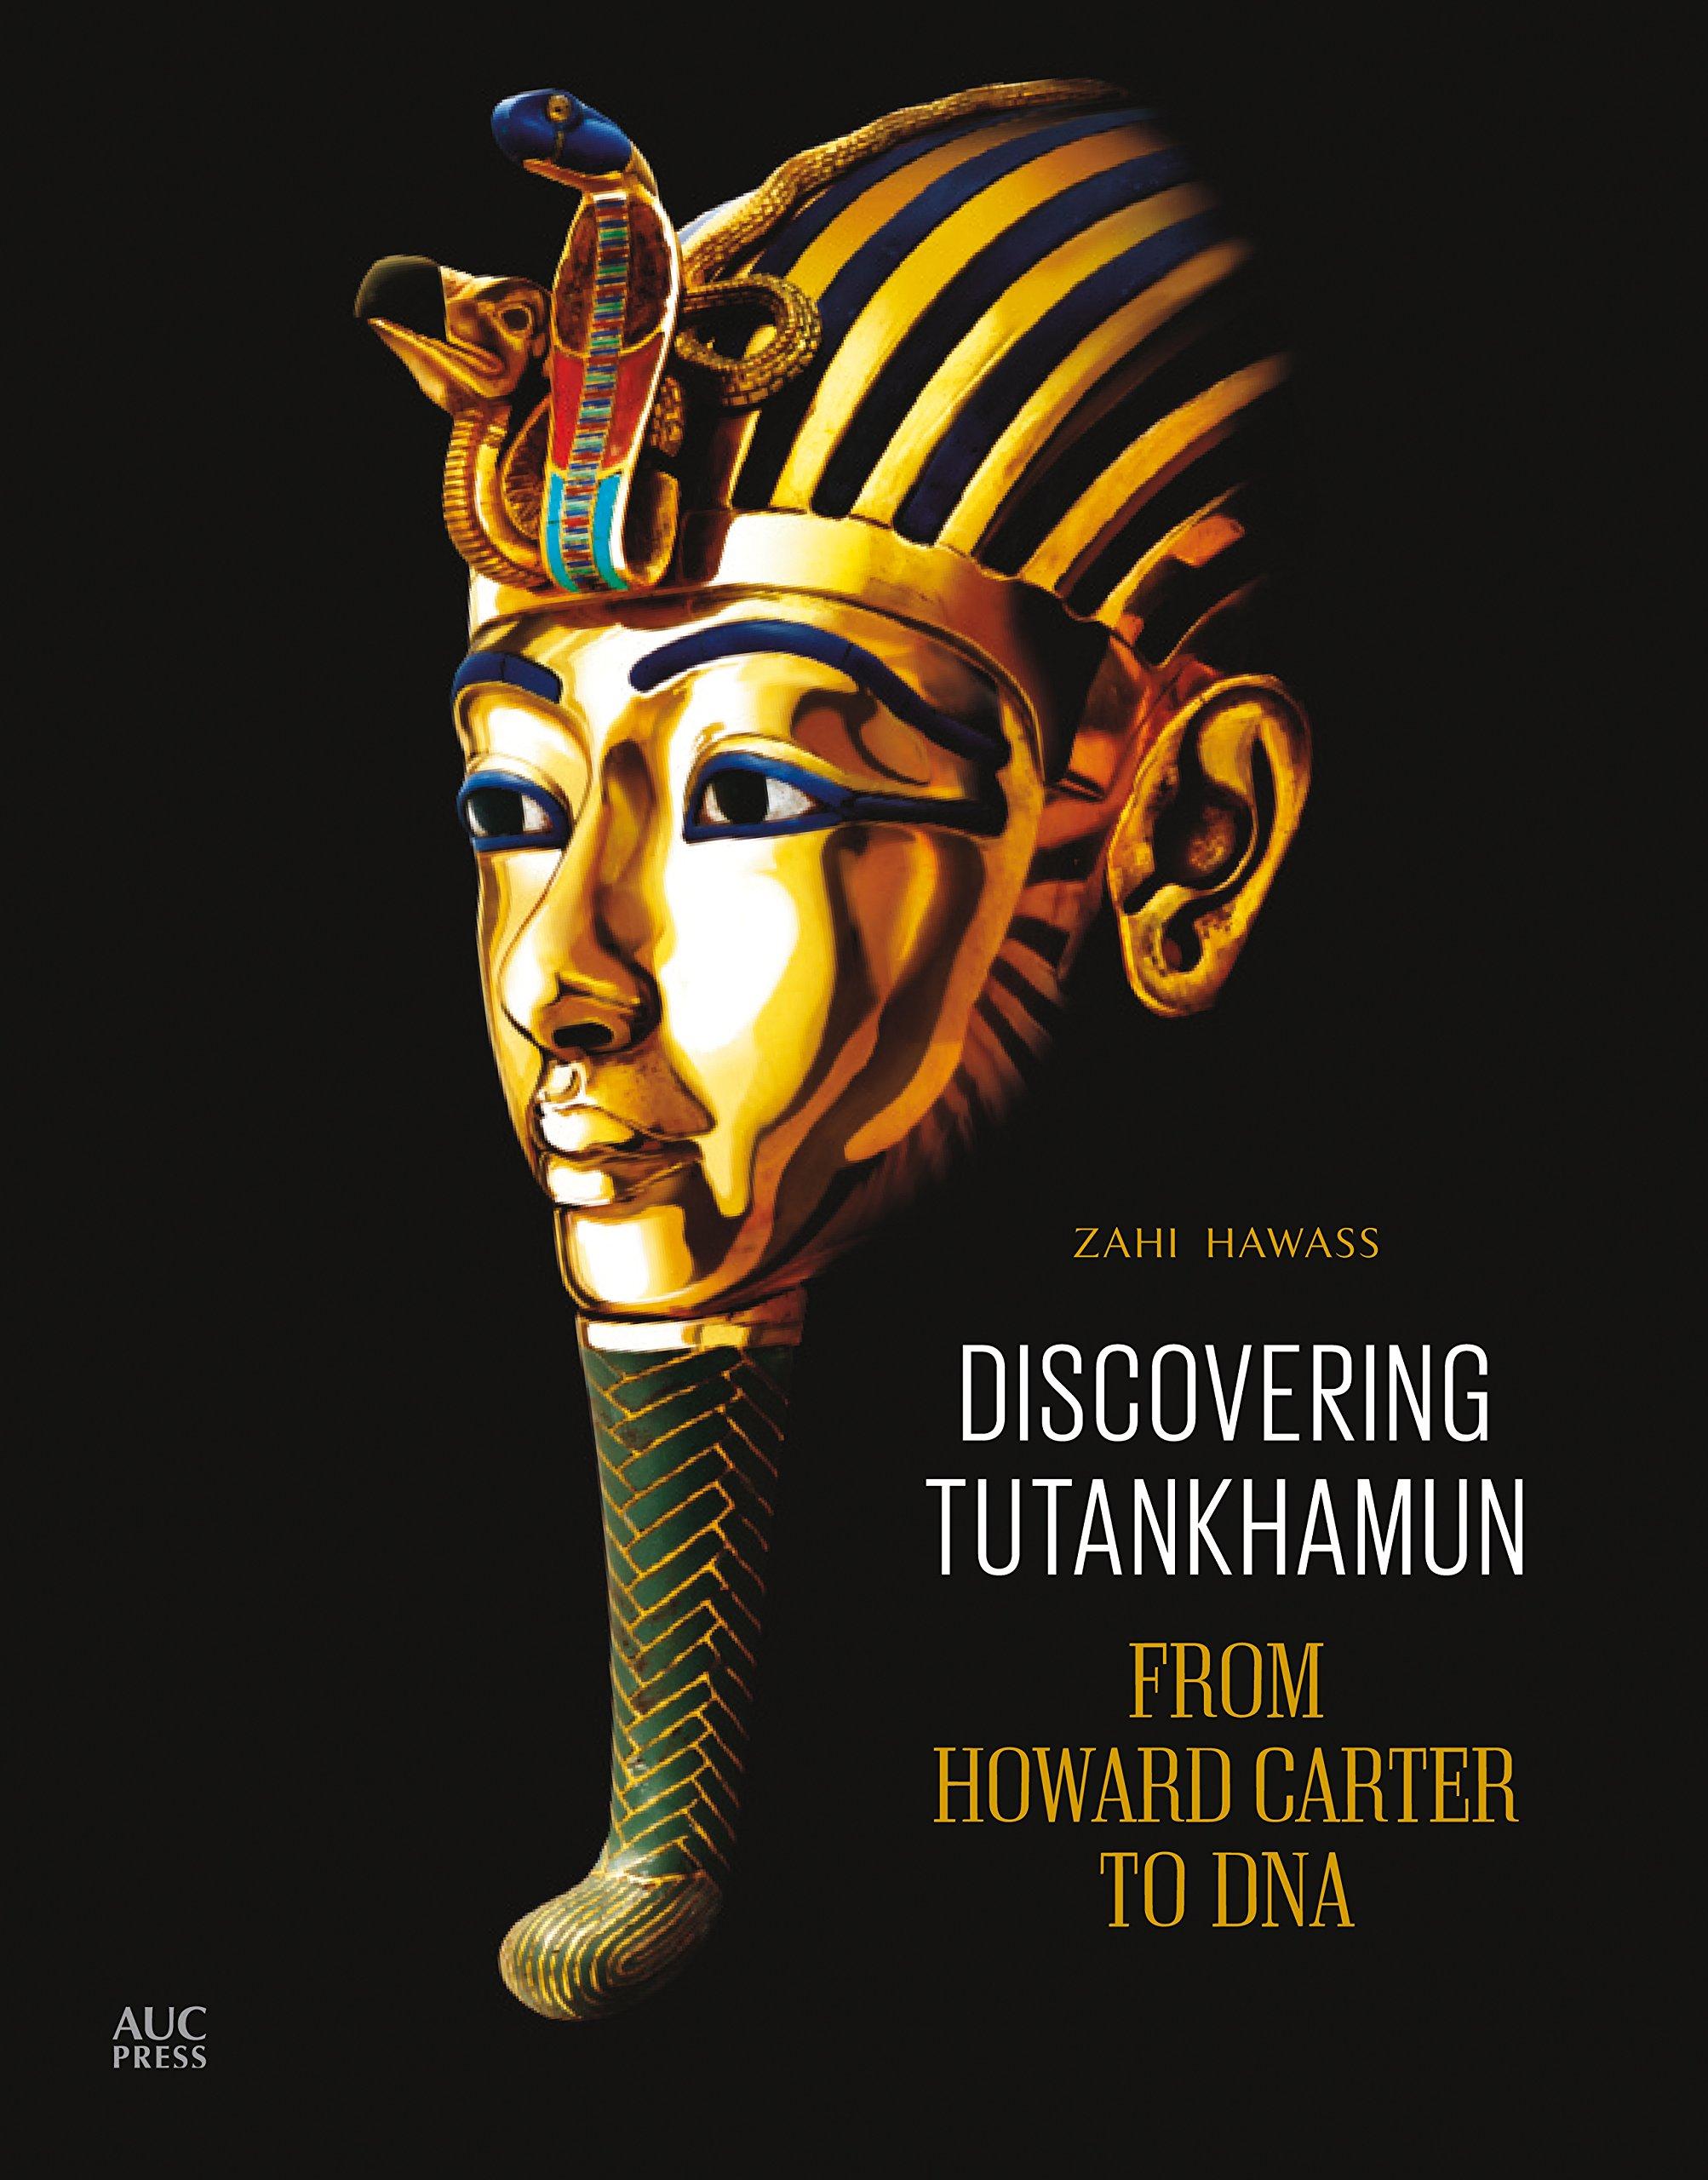 Discovering Tutankhamun: From Howard Carter to DNA: Amazon.es: Hawass, Zahi: Libros en idiomas extranjeros